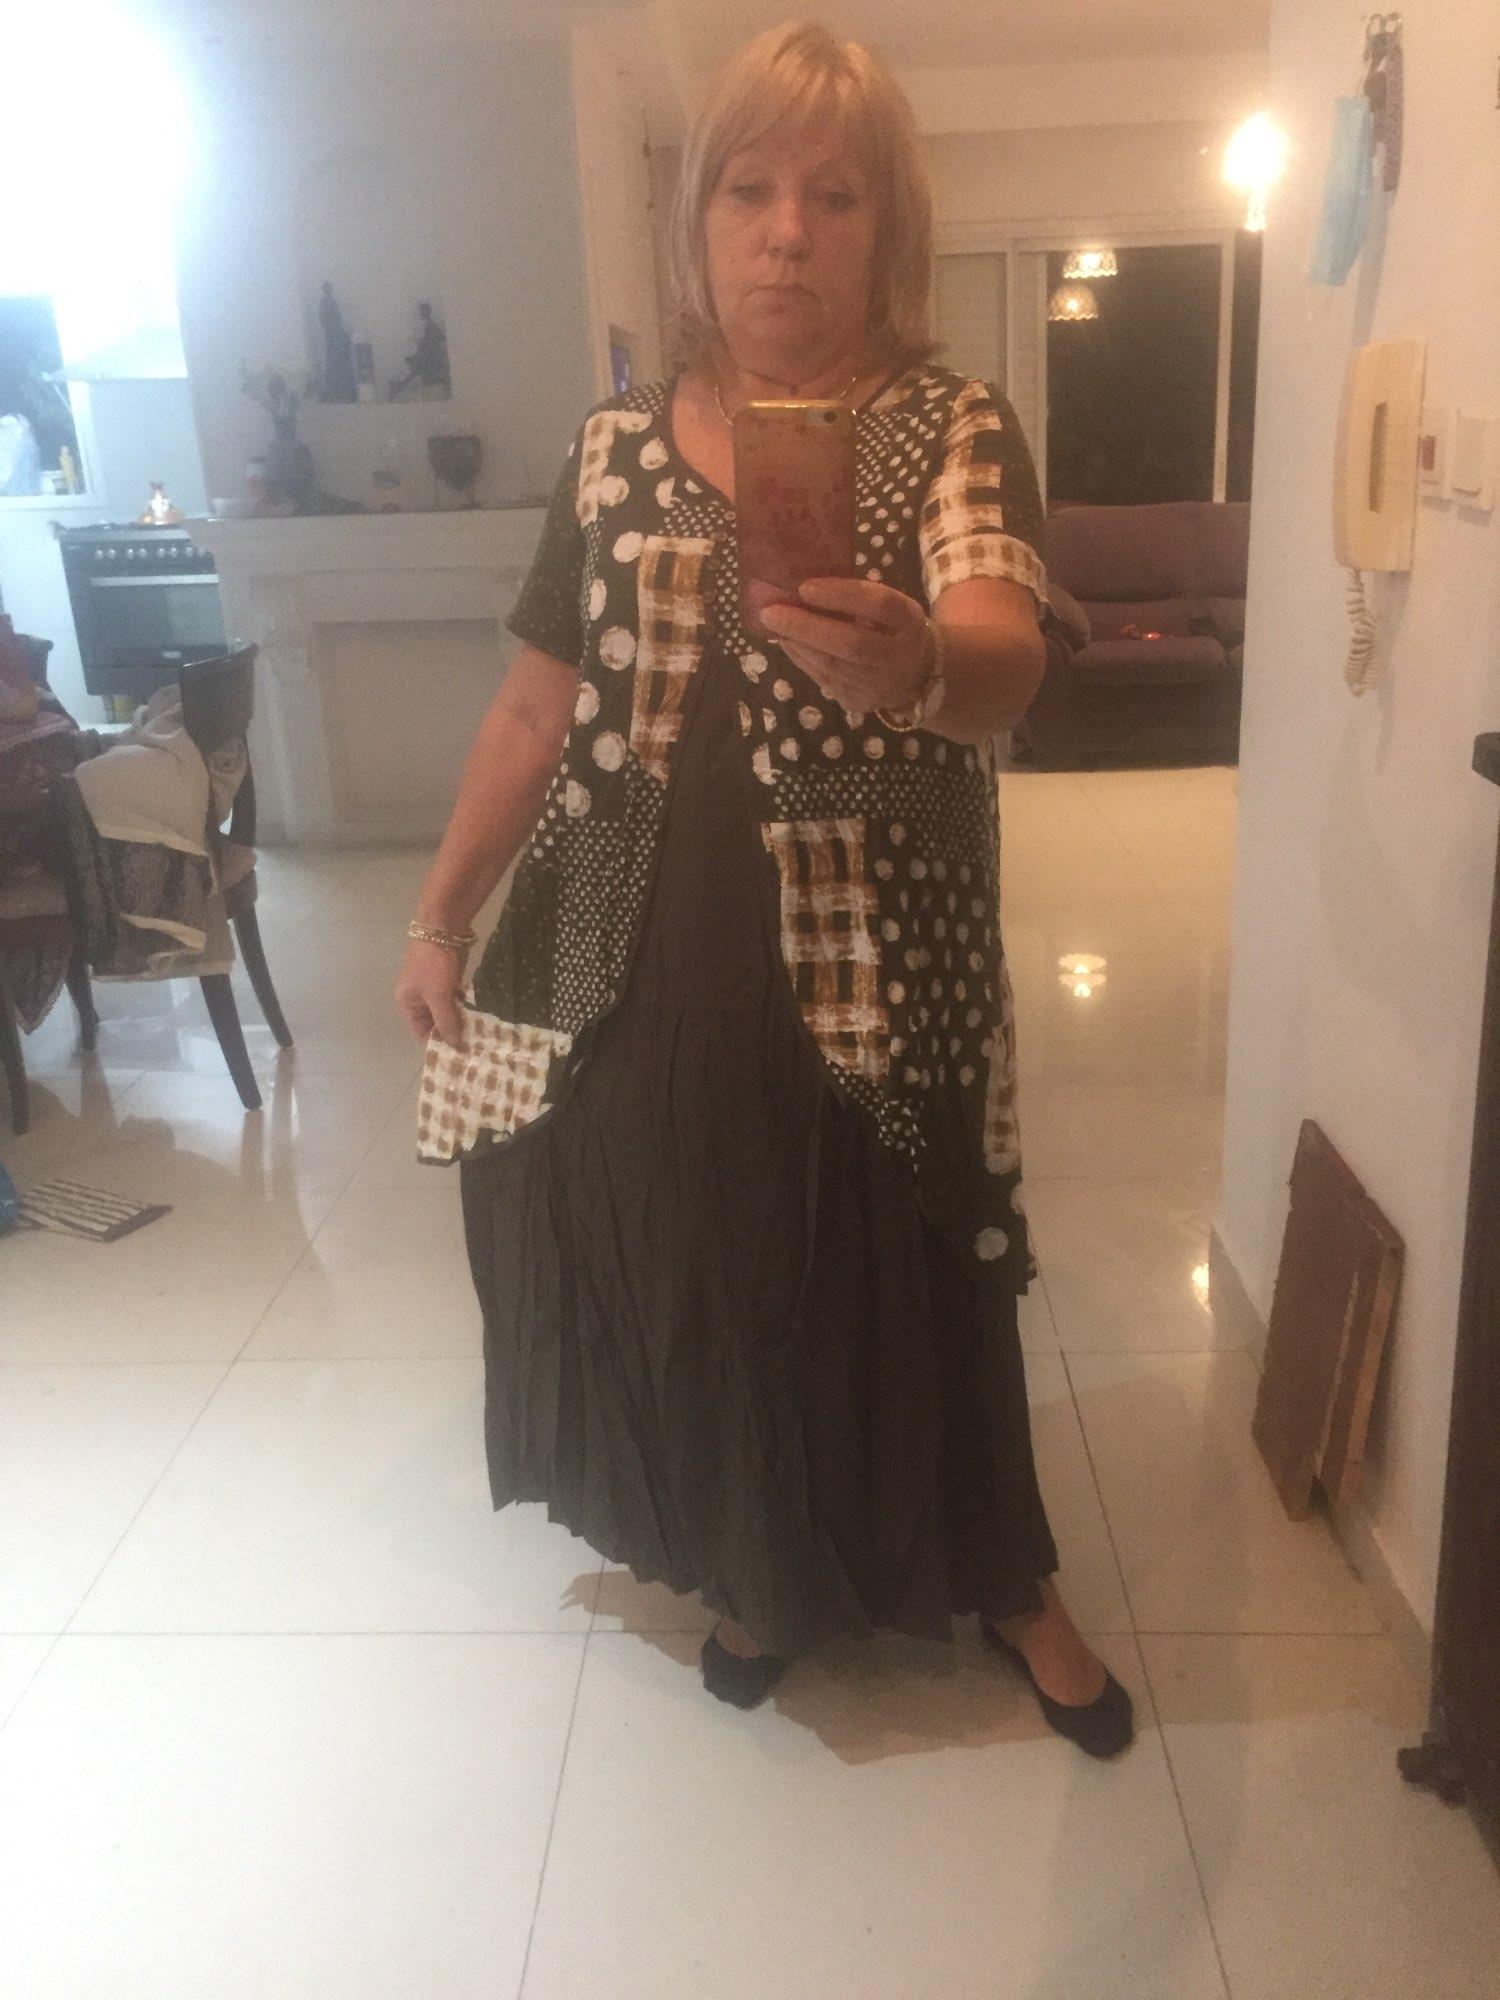 2021 ZANZEA Maxi Long Dress Autumn Summer Dress Women Polka Dot Print Patchwork SundressPleated Plus Size Sexy V Neck Vestidos reviews №2 508665